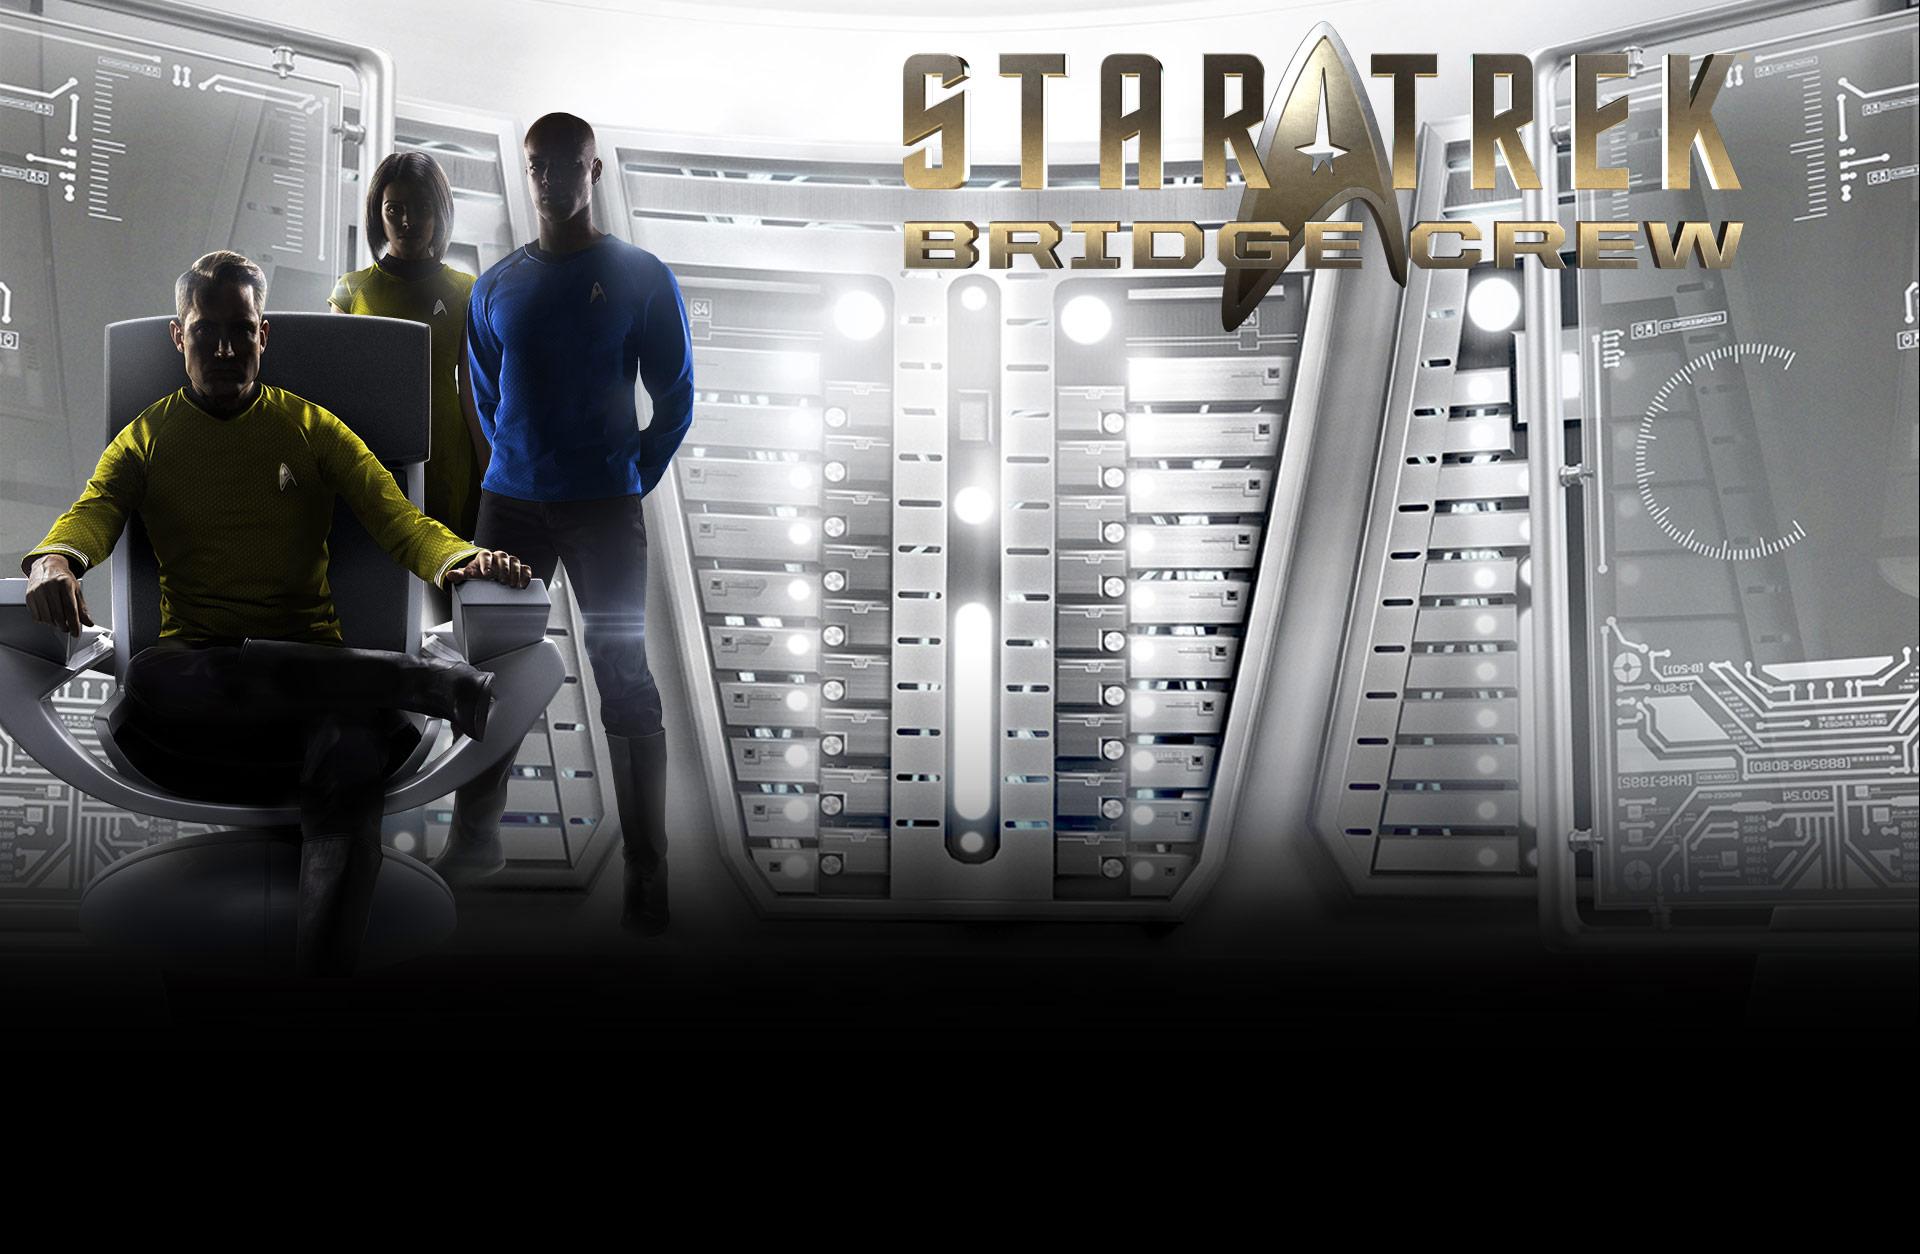 Star Trek: Bridge Crew (includes VR mode) - $6.95 @ GamesLoad (PC)